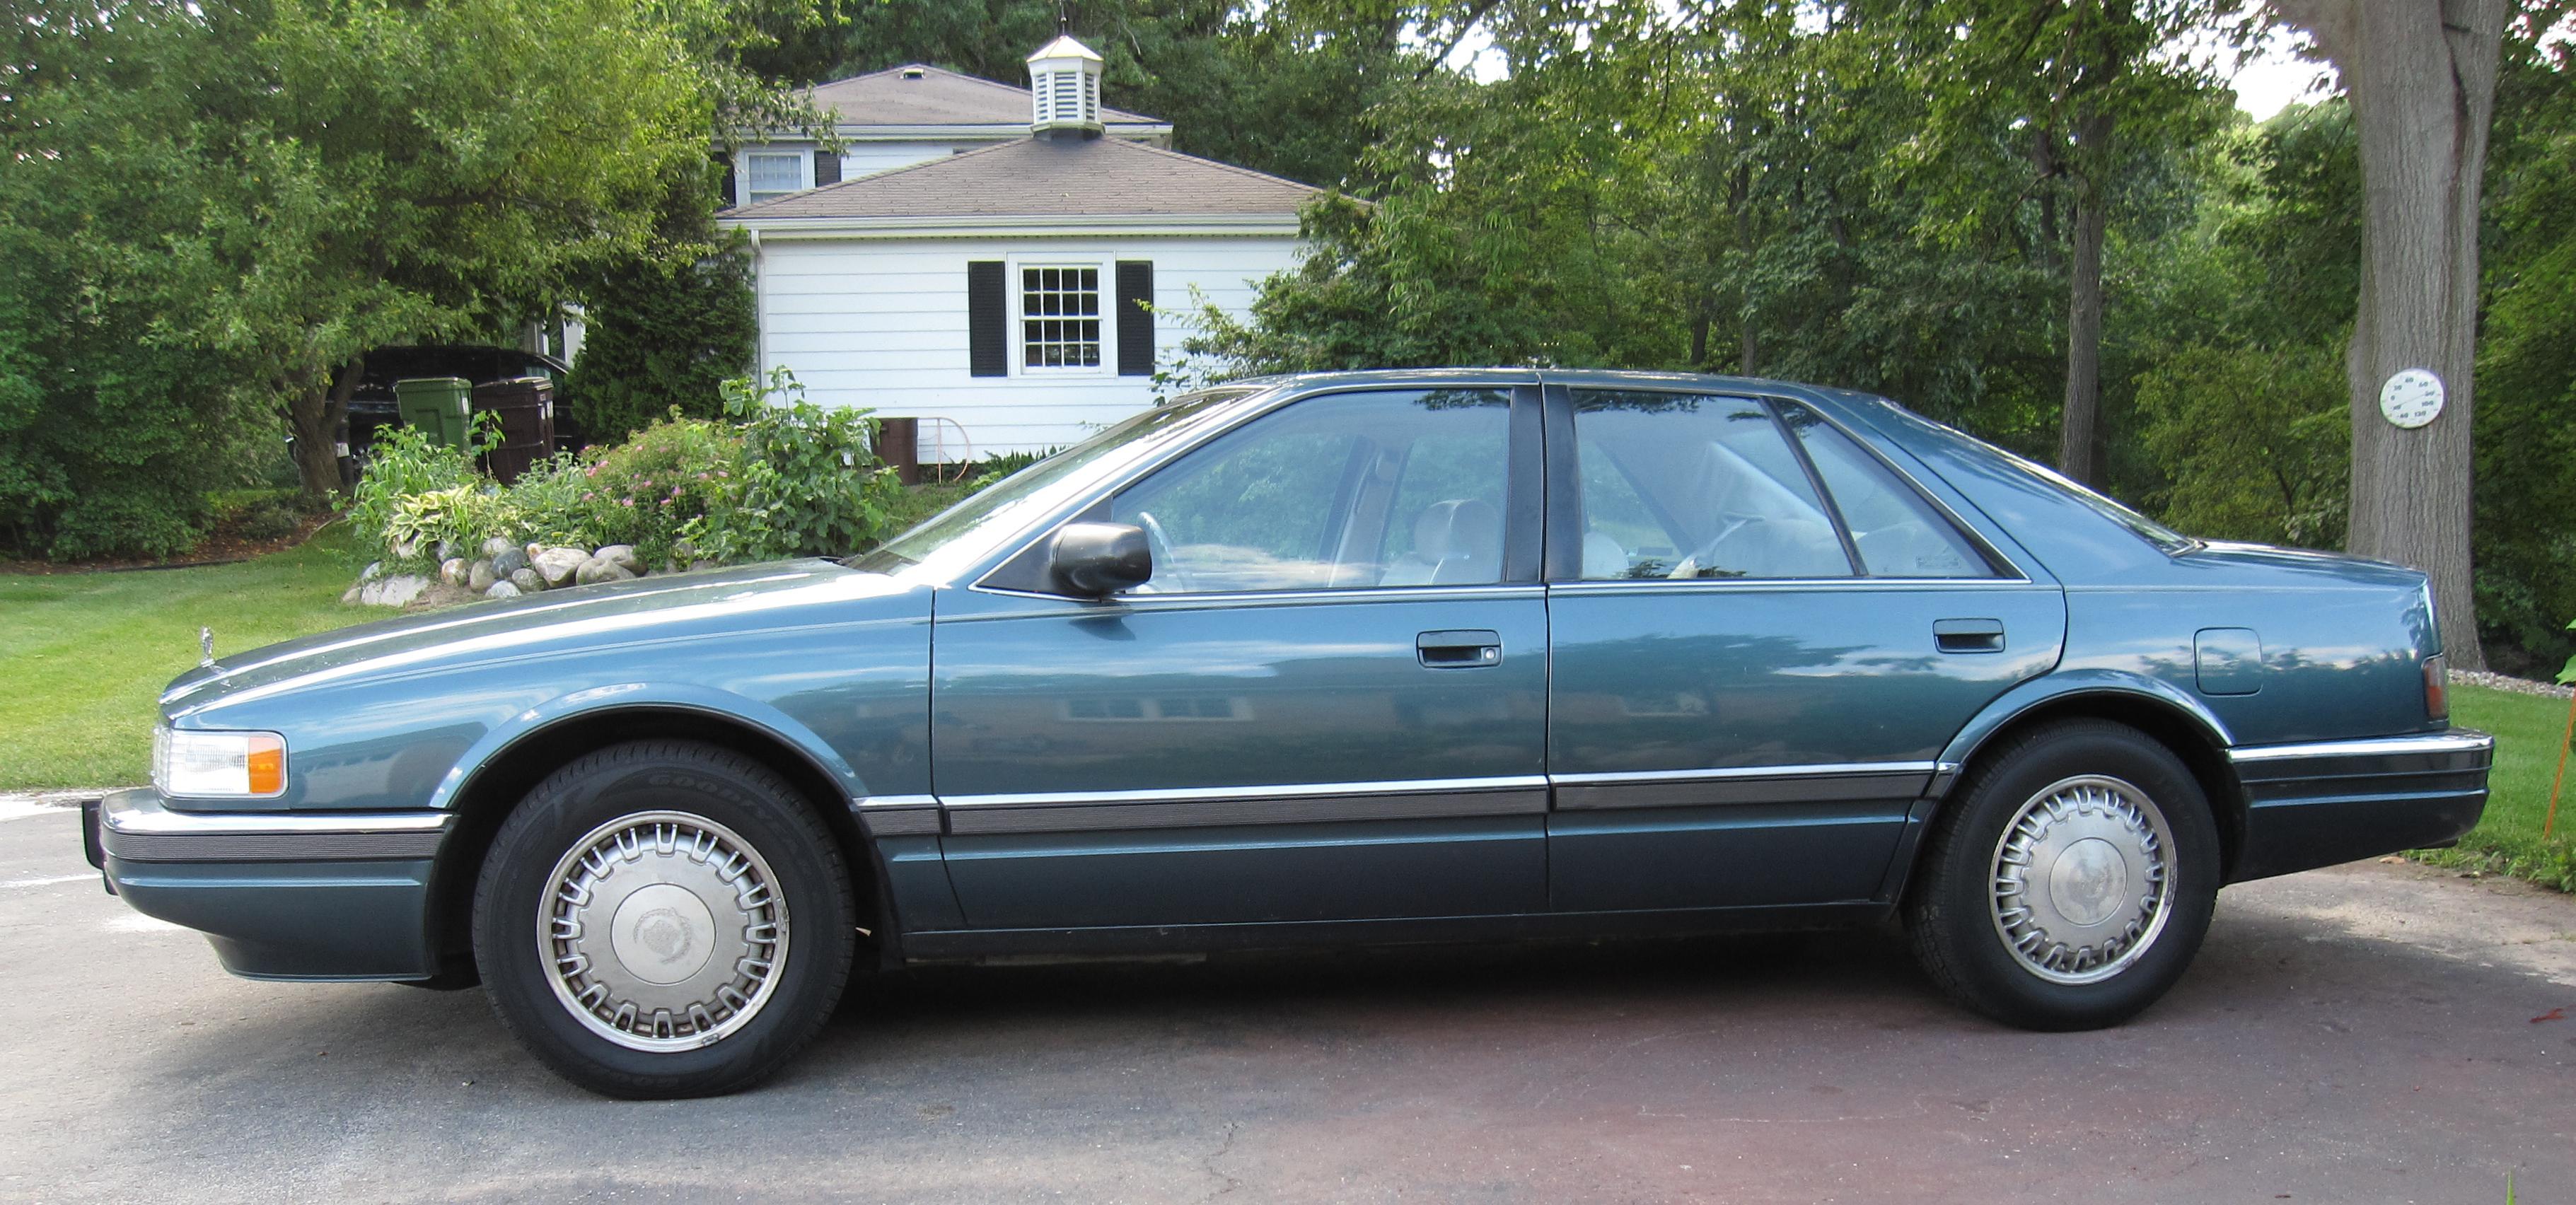 1992 Cadillac Seville Image 5